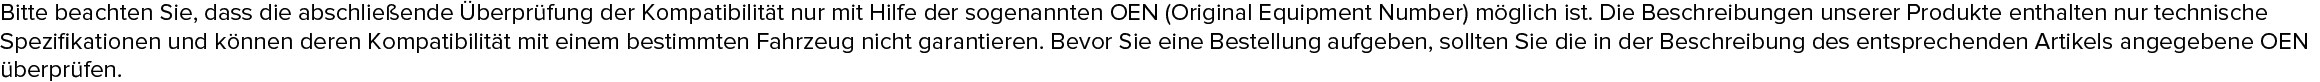 RIDEX 1J0 615 601 D Bremsscheibe